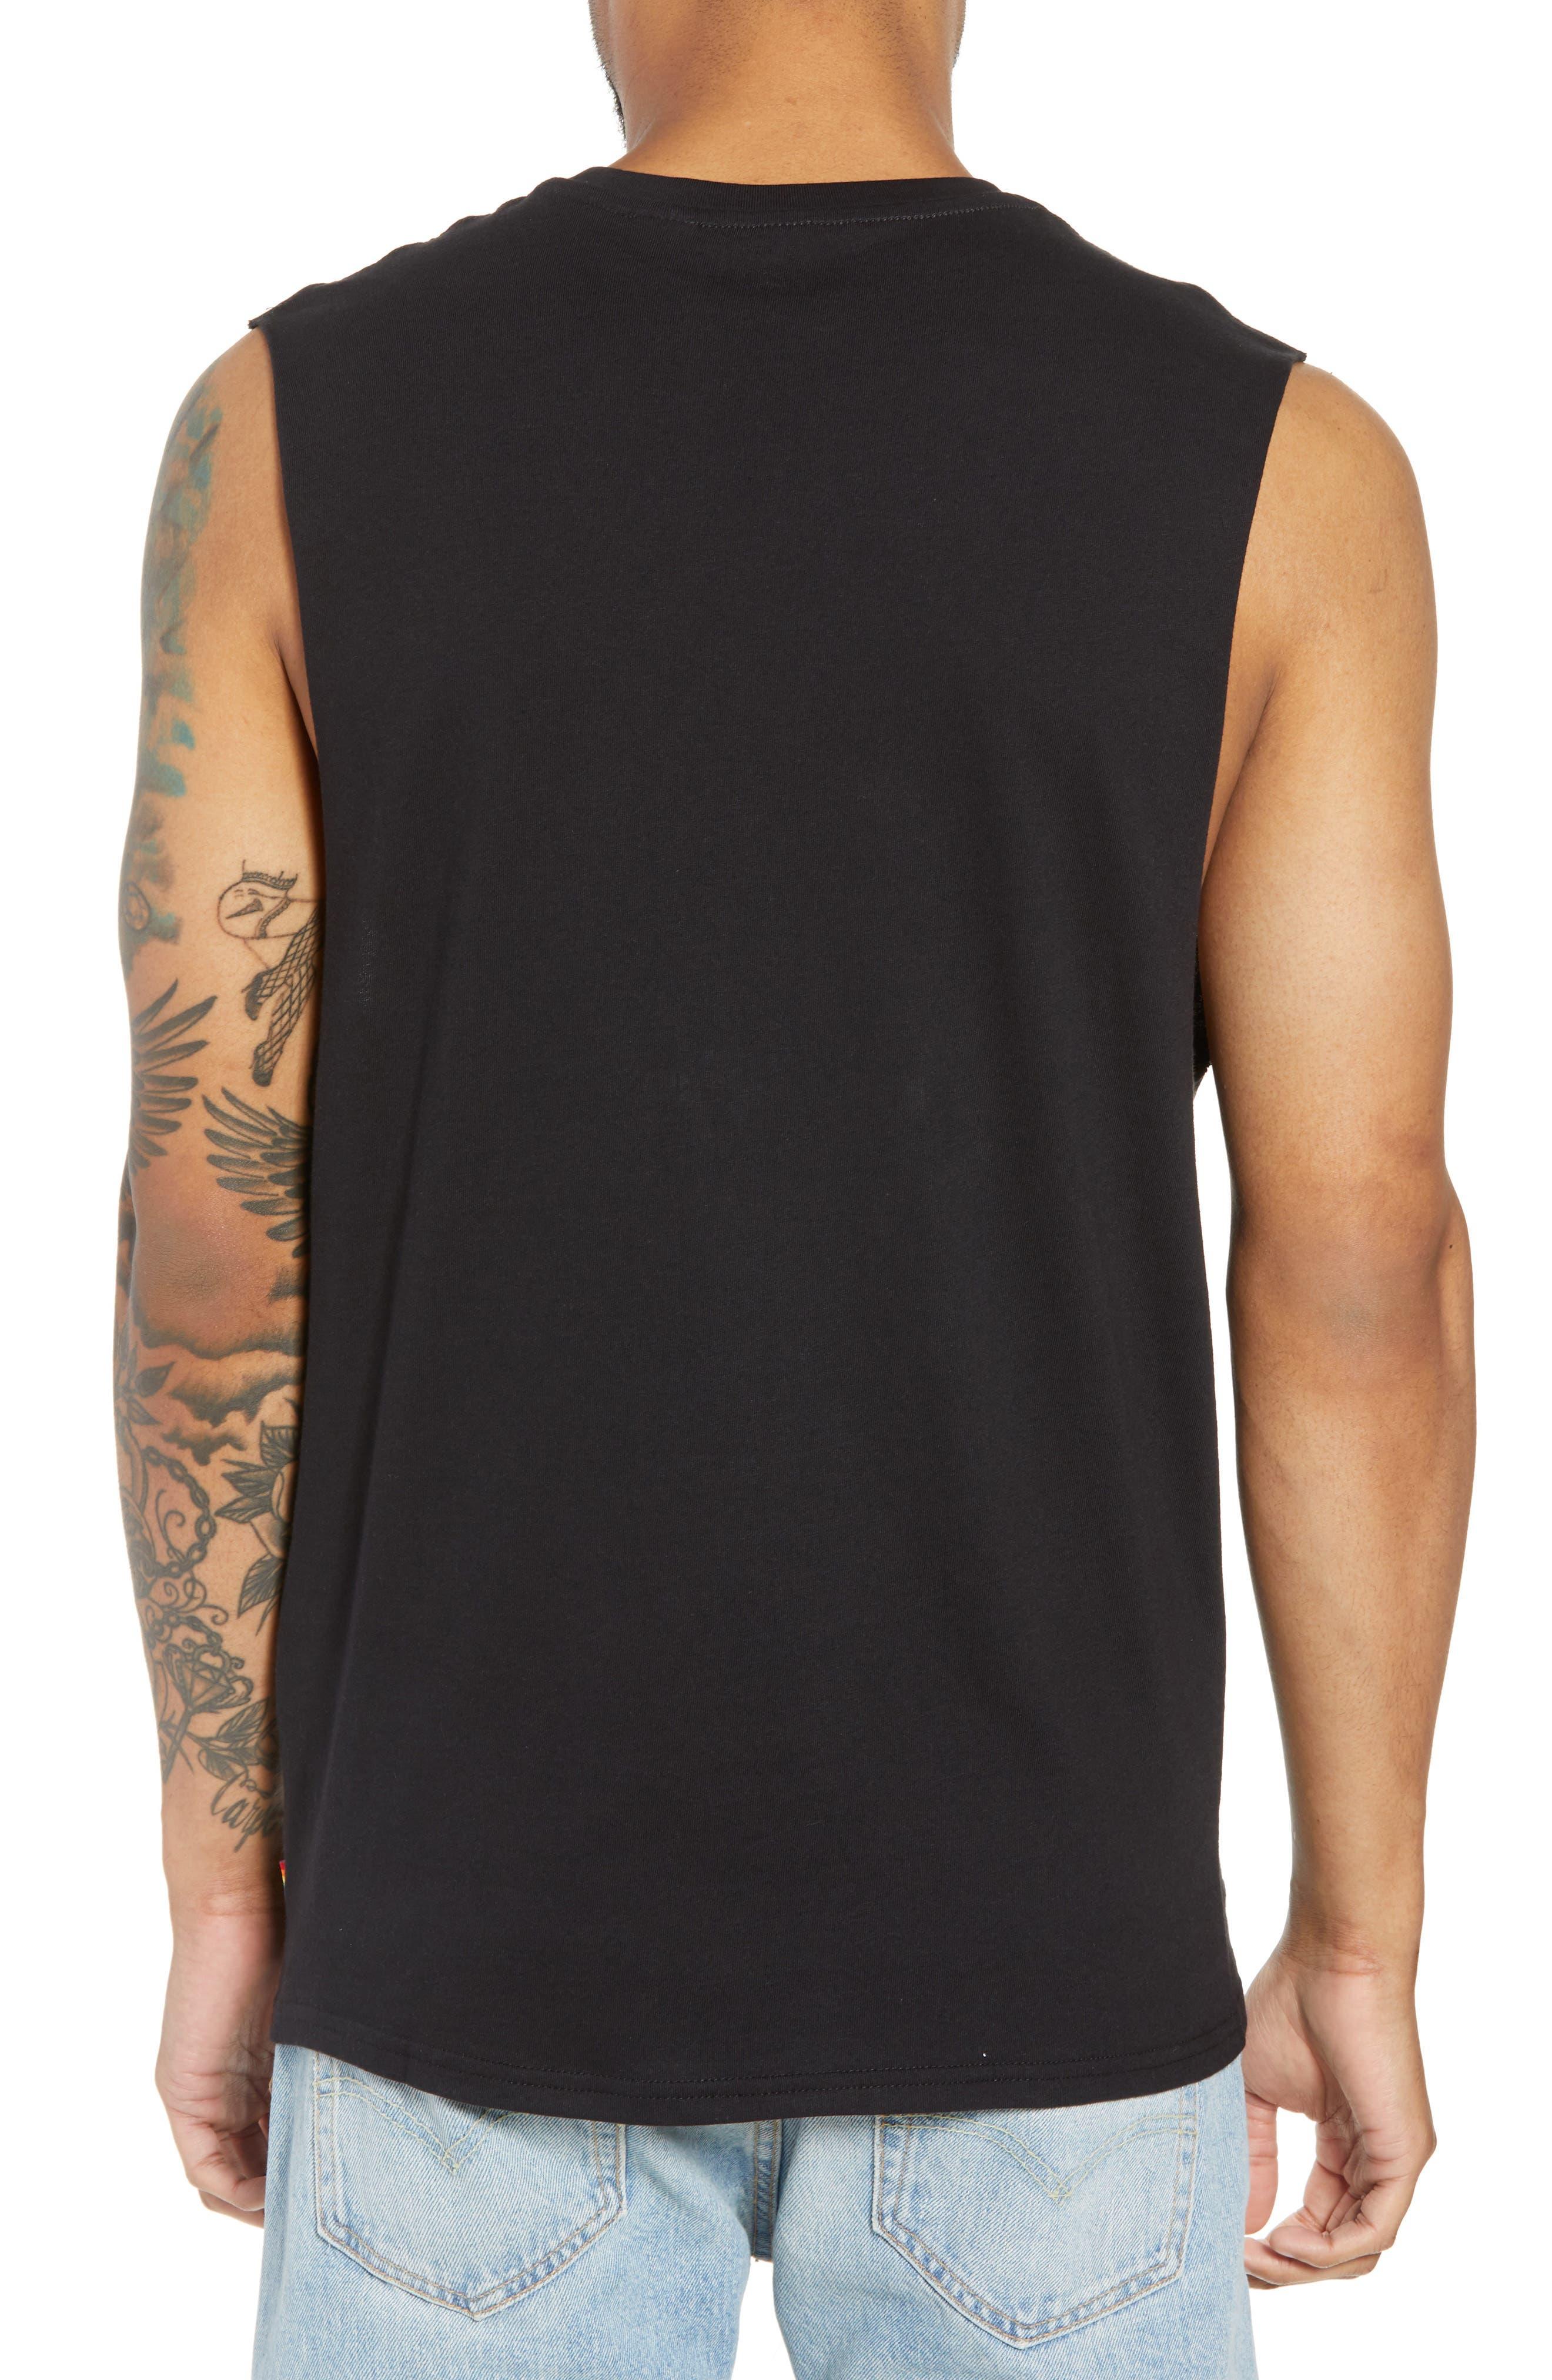 Community Sleeveless T-Shirt,                             Alternate thumbnail 2, color,                             RAINBOW GRADIENT BLACK